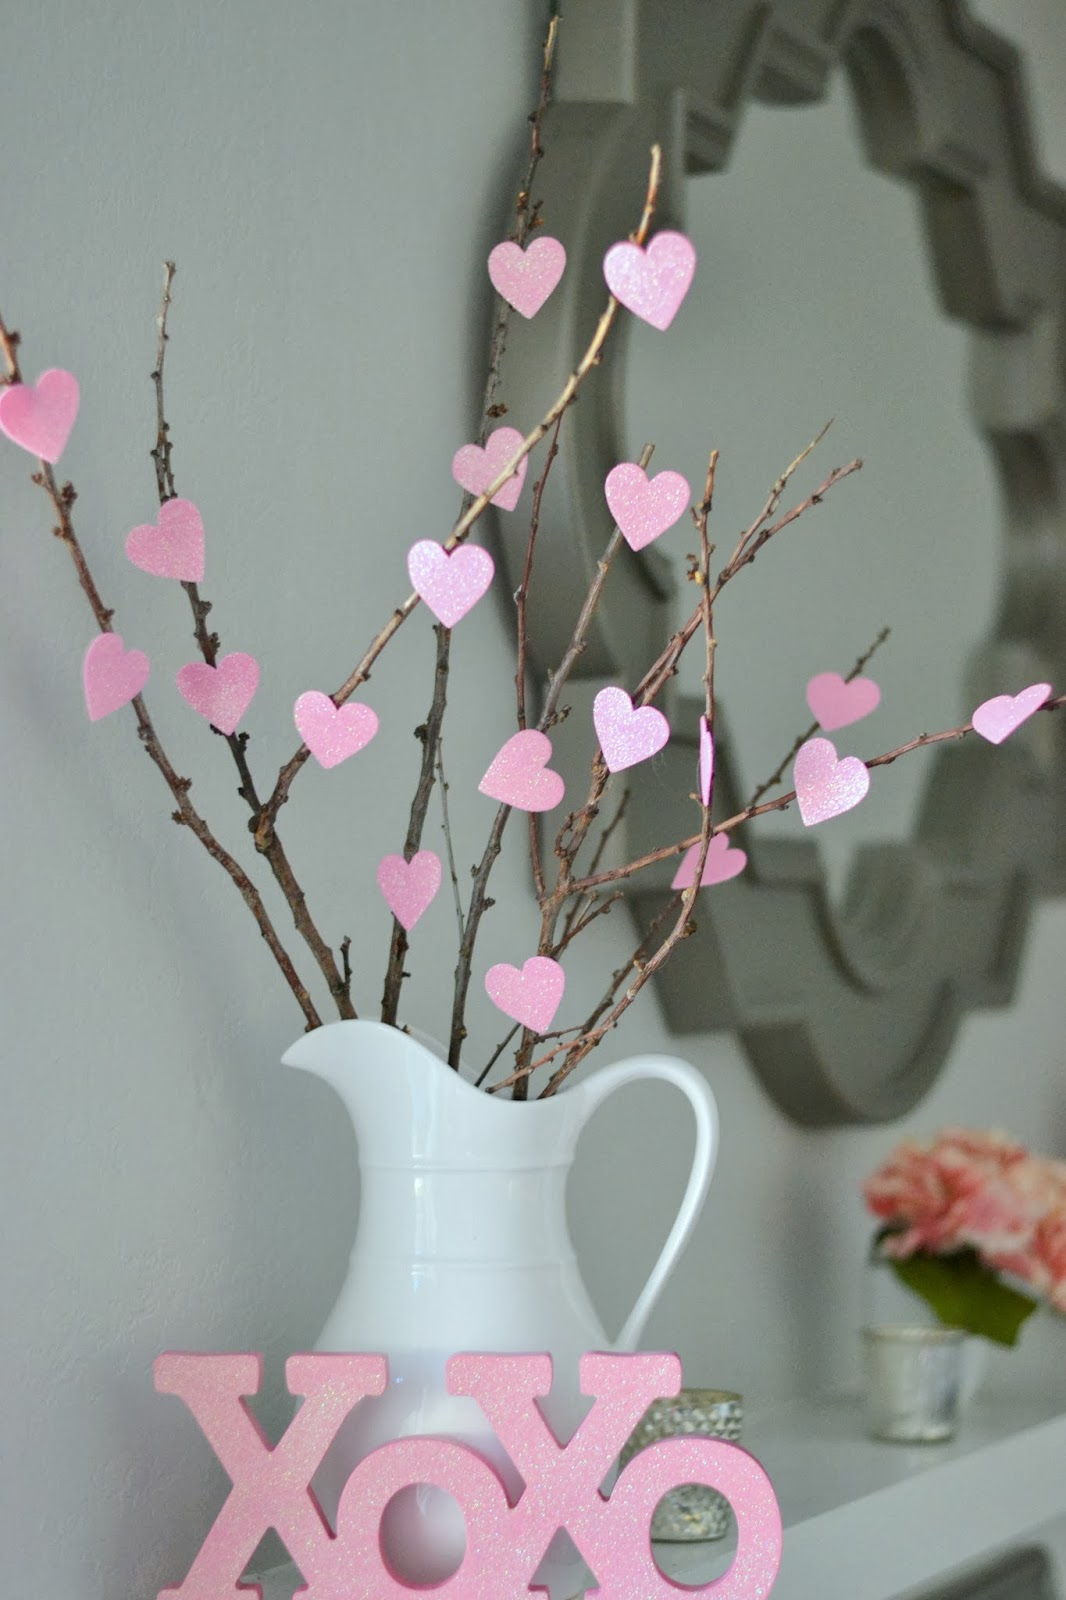 Valentine's Day Decor: Heart branches